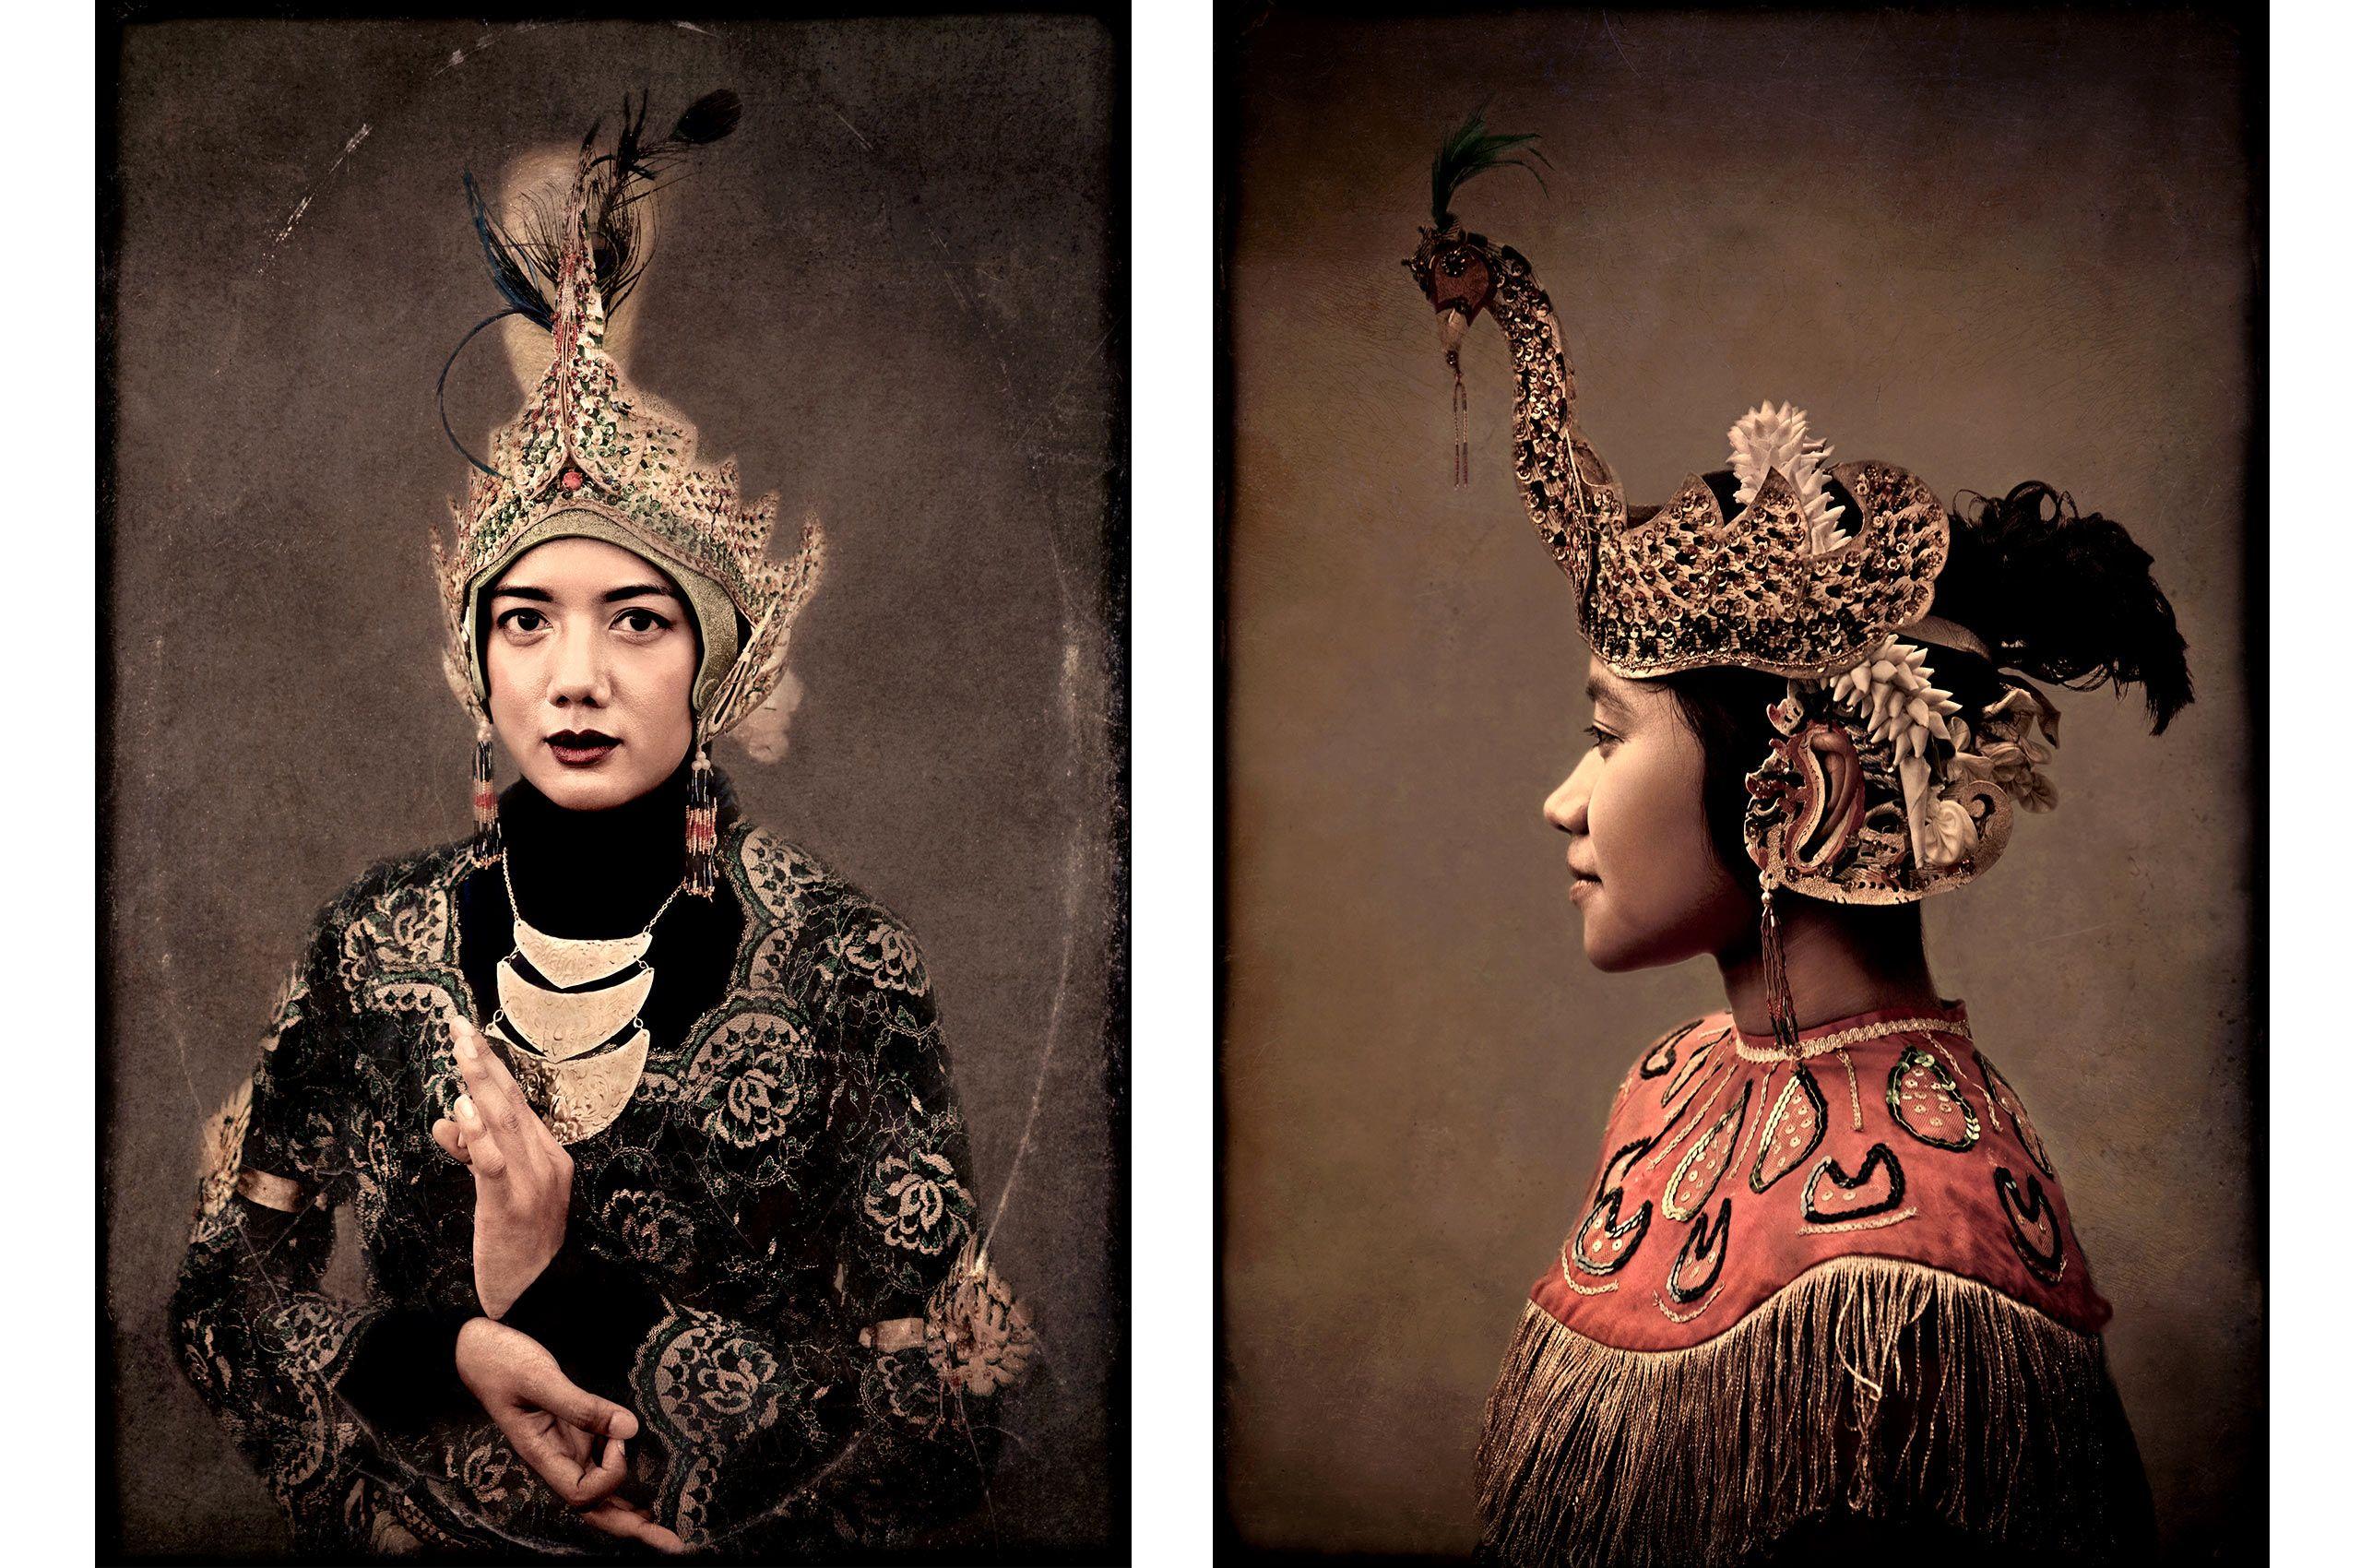 Vina-Javanese Heritage and Aya-Indonesian Heritage